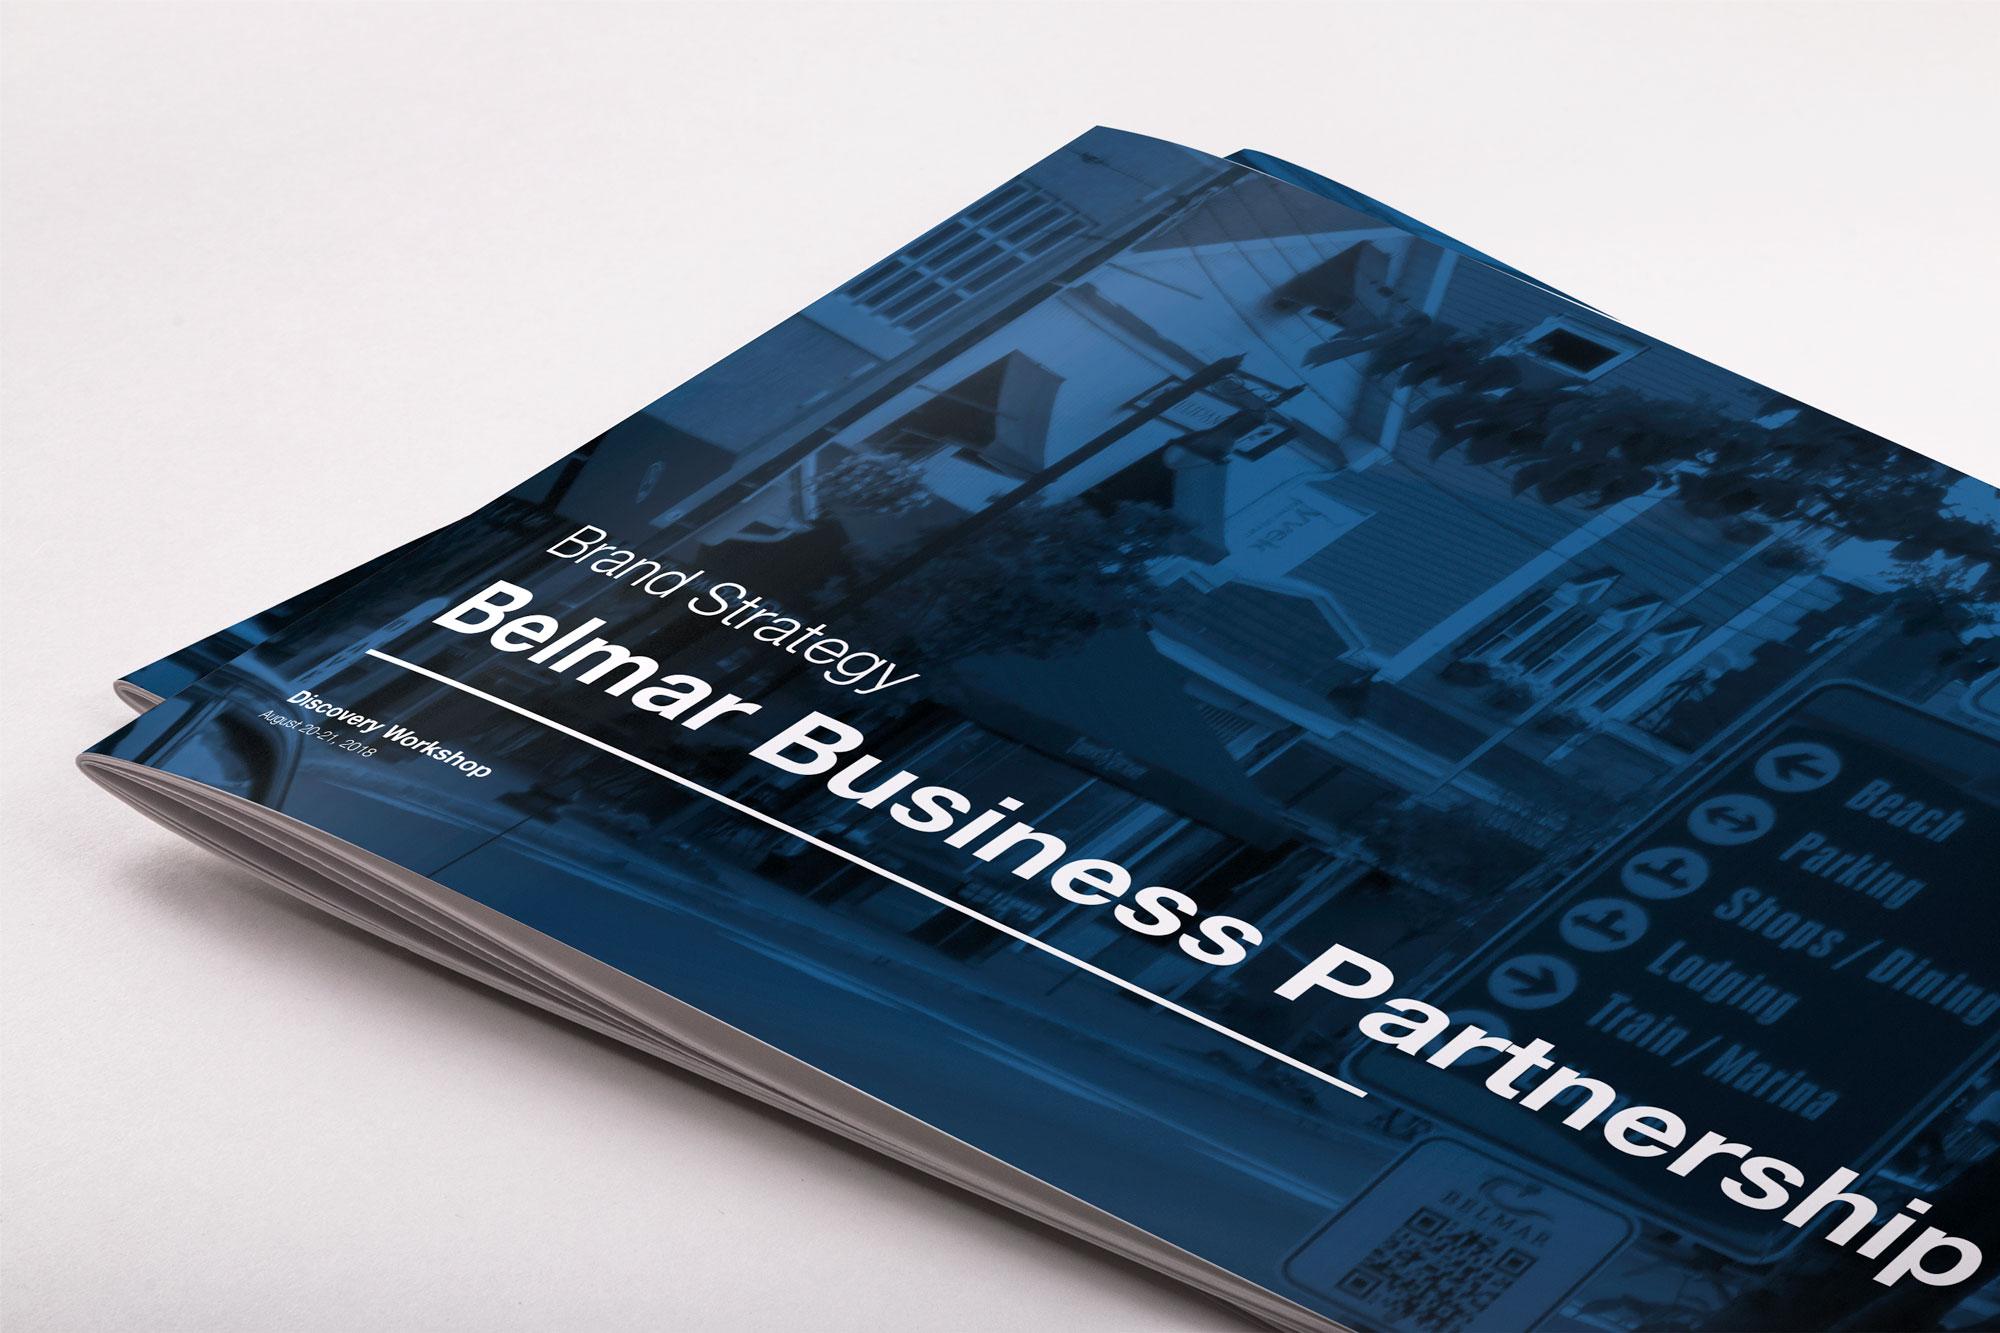 brand-design-capabilities-nj-ny-process-belmar-business-partnership-brochure-1.jpg